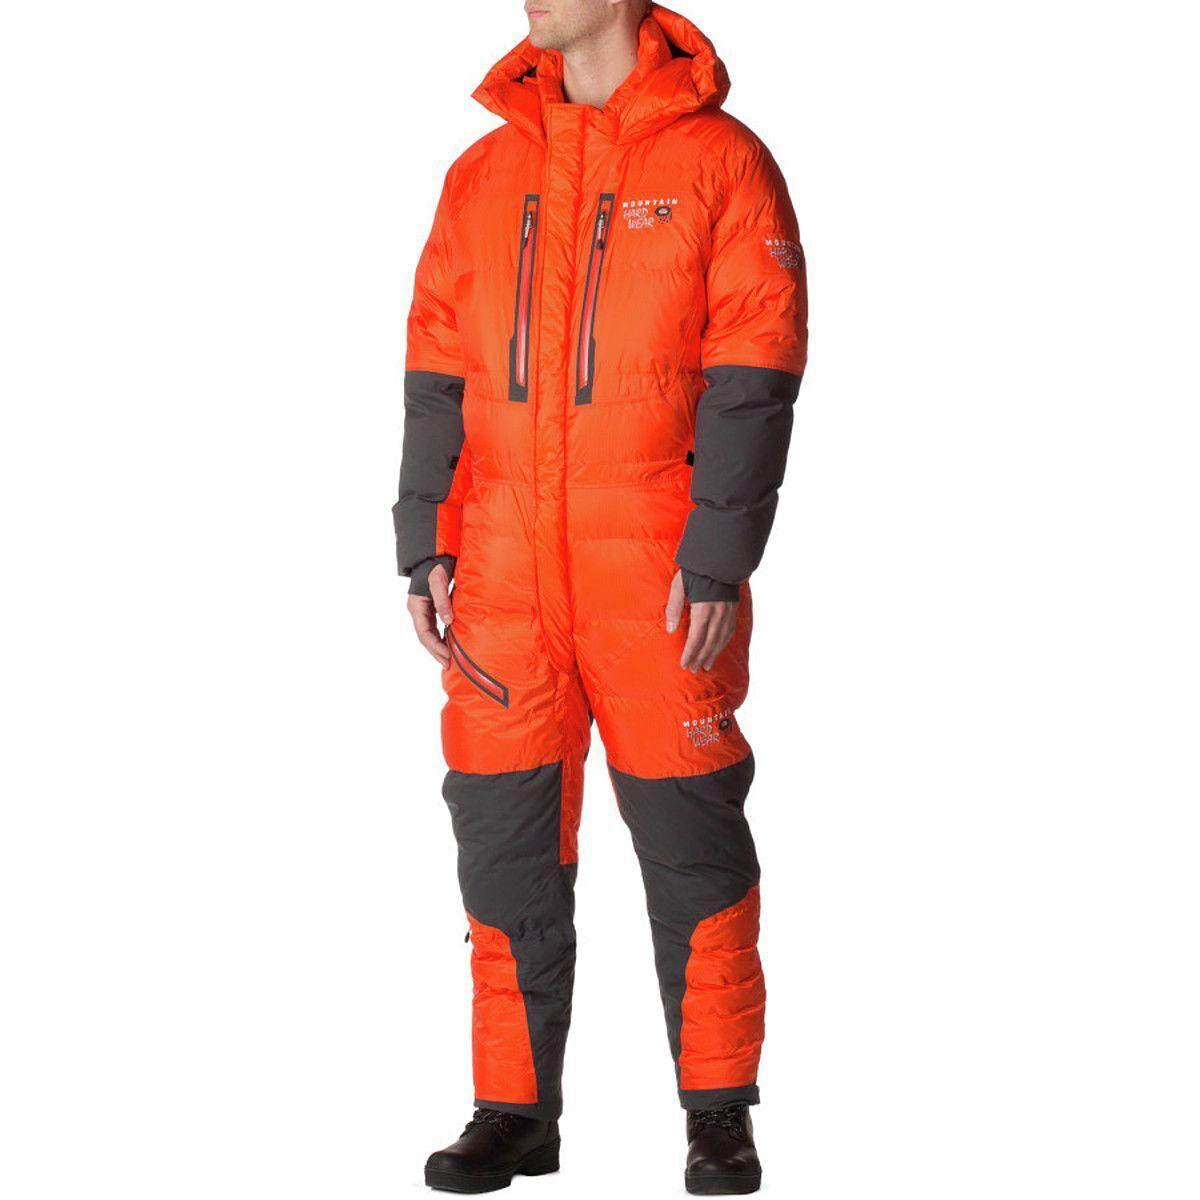 Mountain Hardwear Absolute Zero Suit